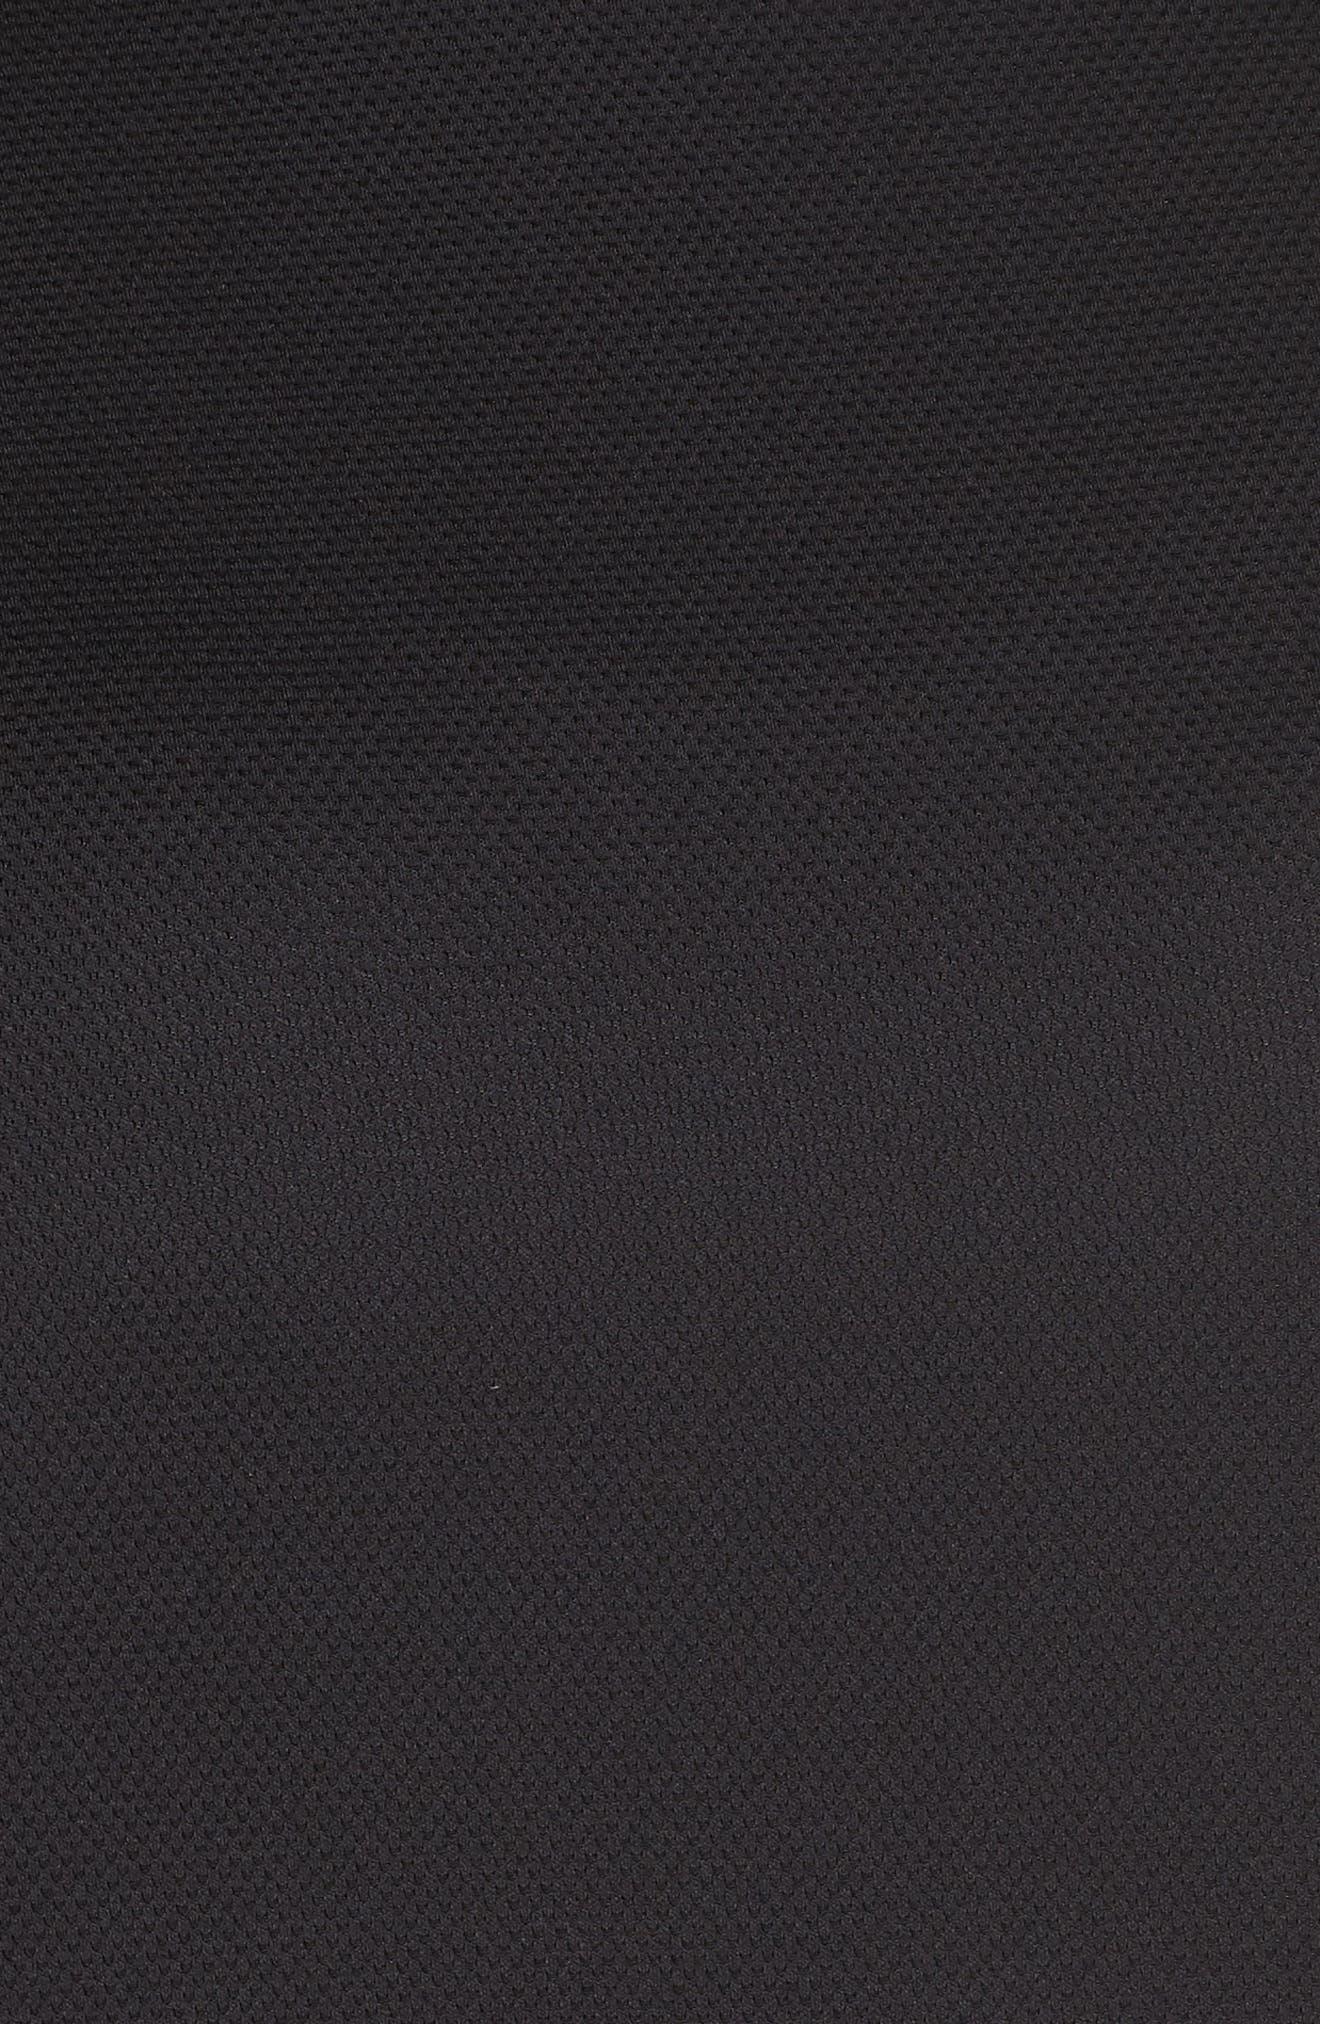 All About It Funnel Neck Sweatshirt,                             Alternate thumbnail 6, color,                             BLACK